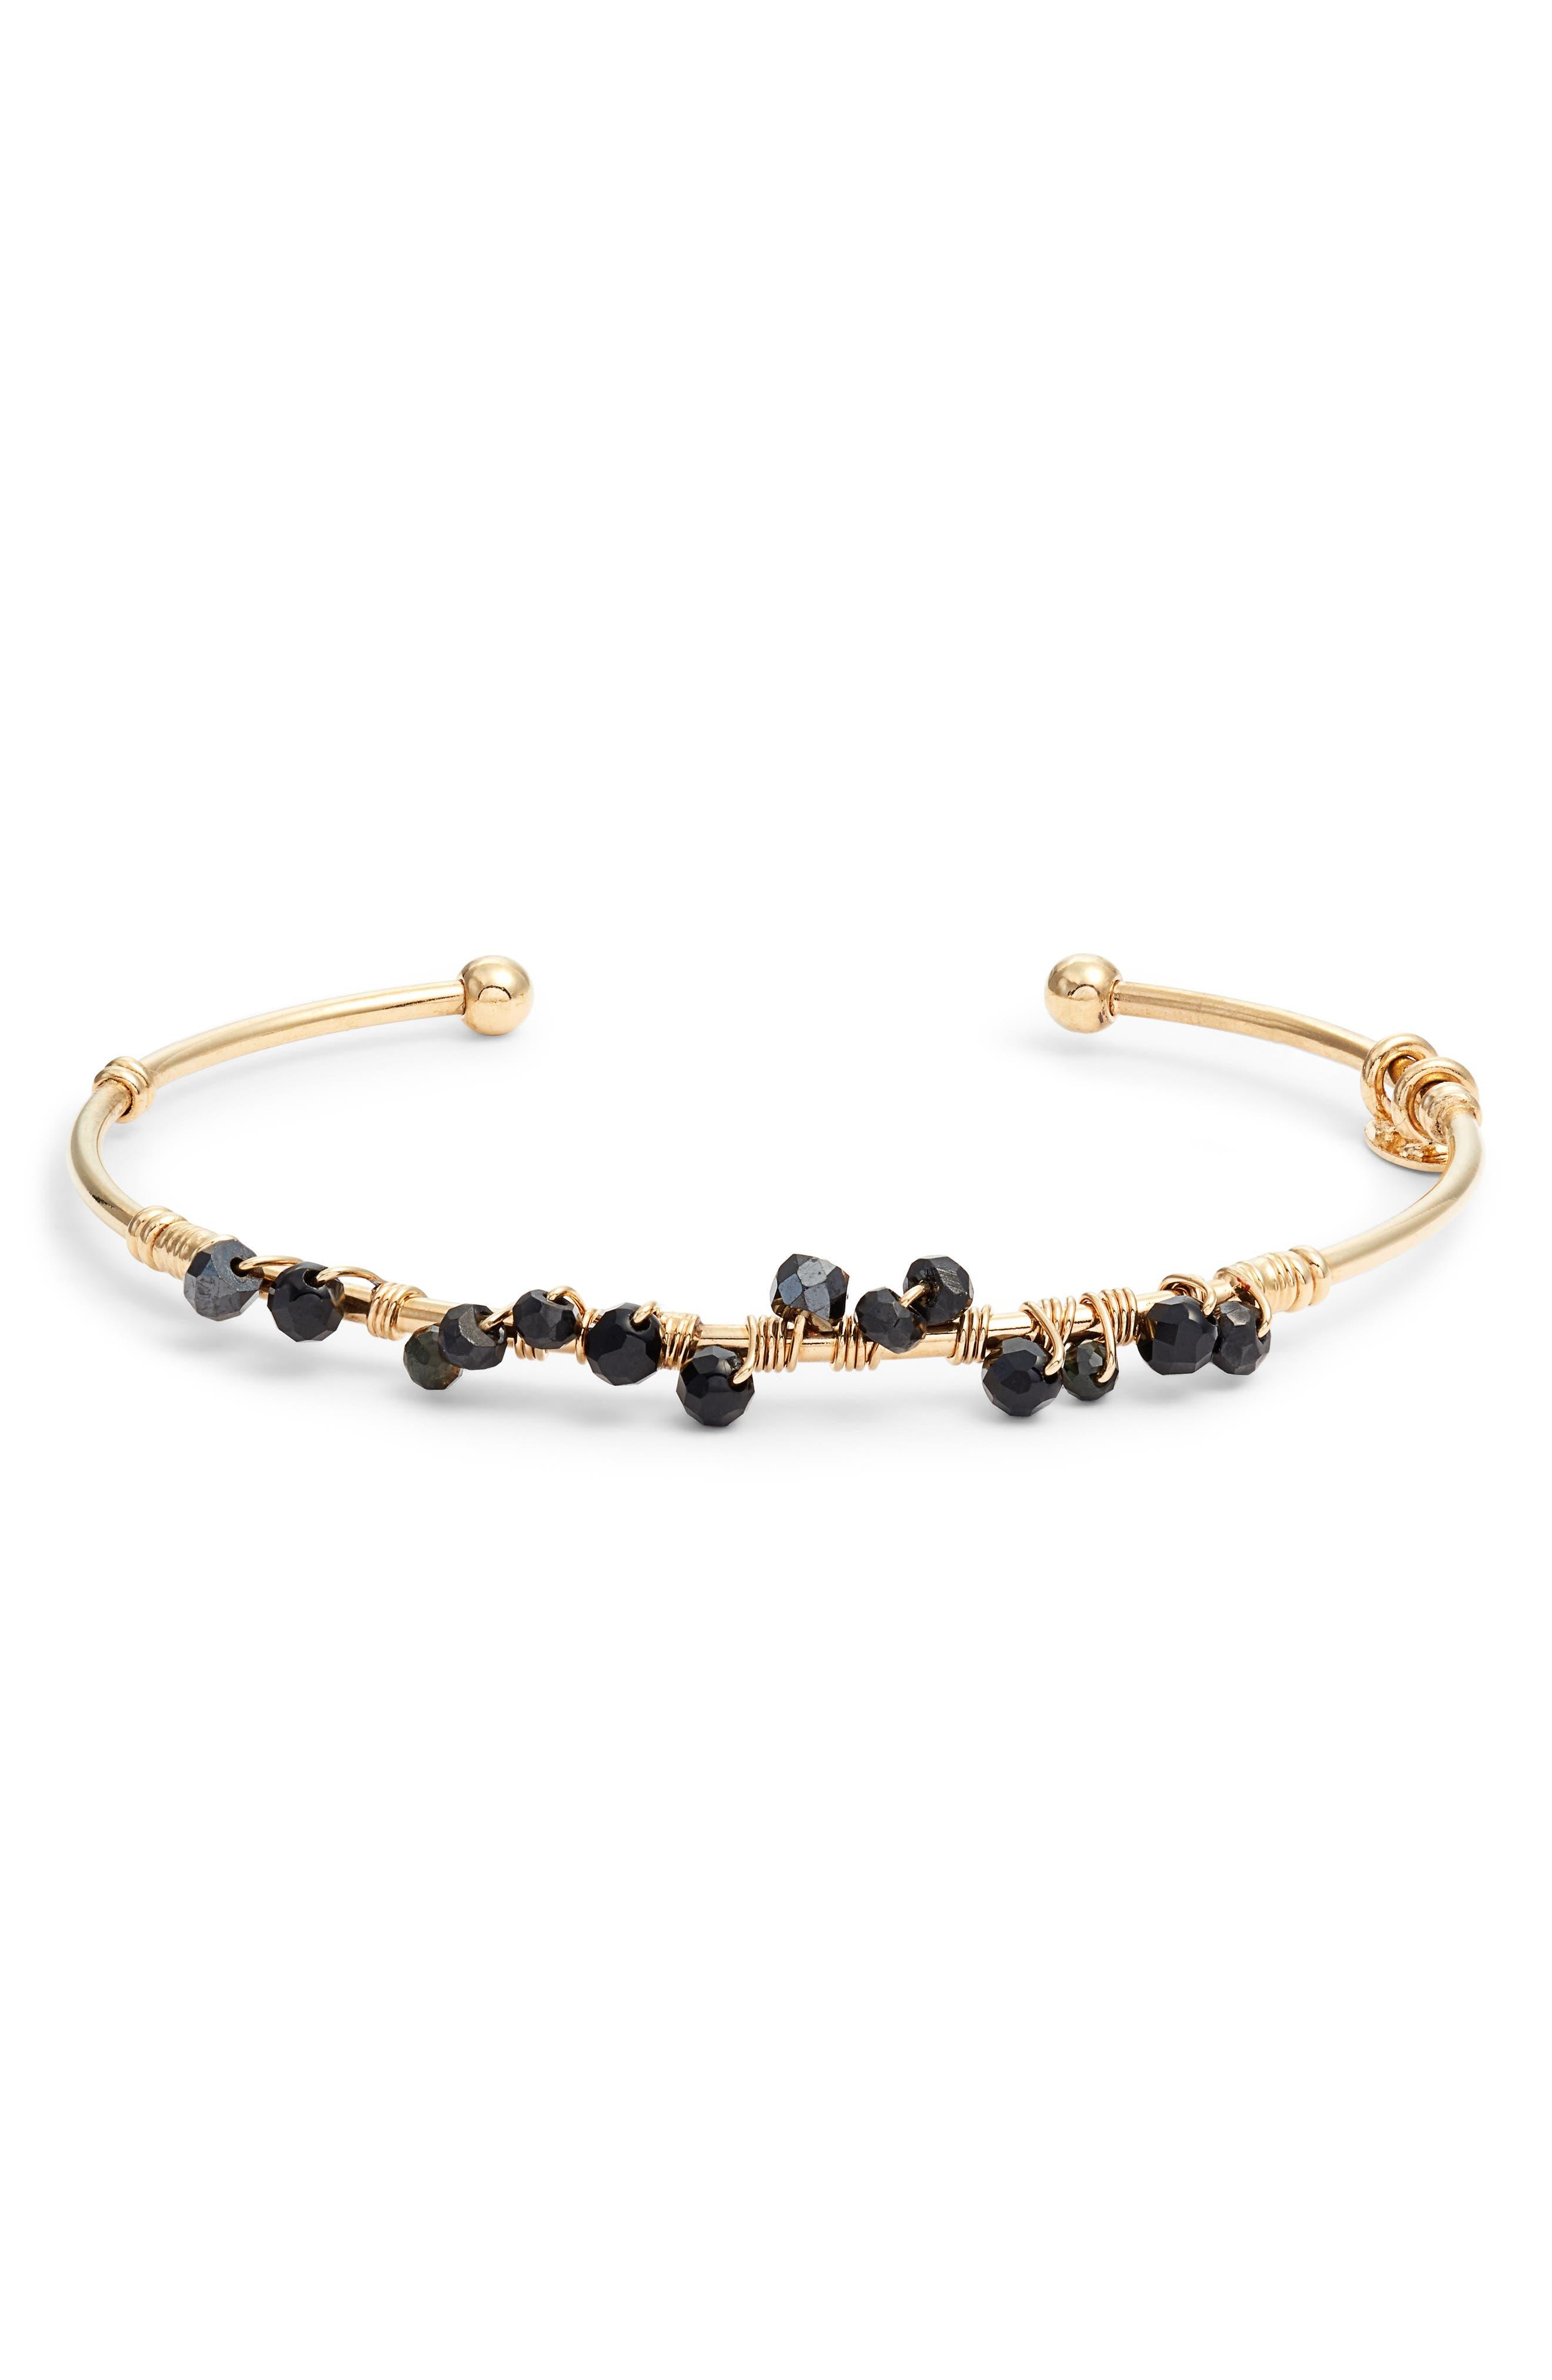 GAS BIJOUX Calliope Cuff Bracelet, Main, color, BLACK